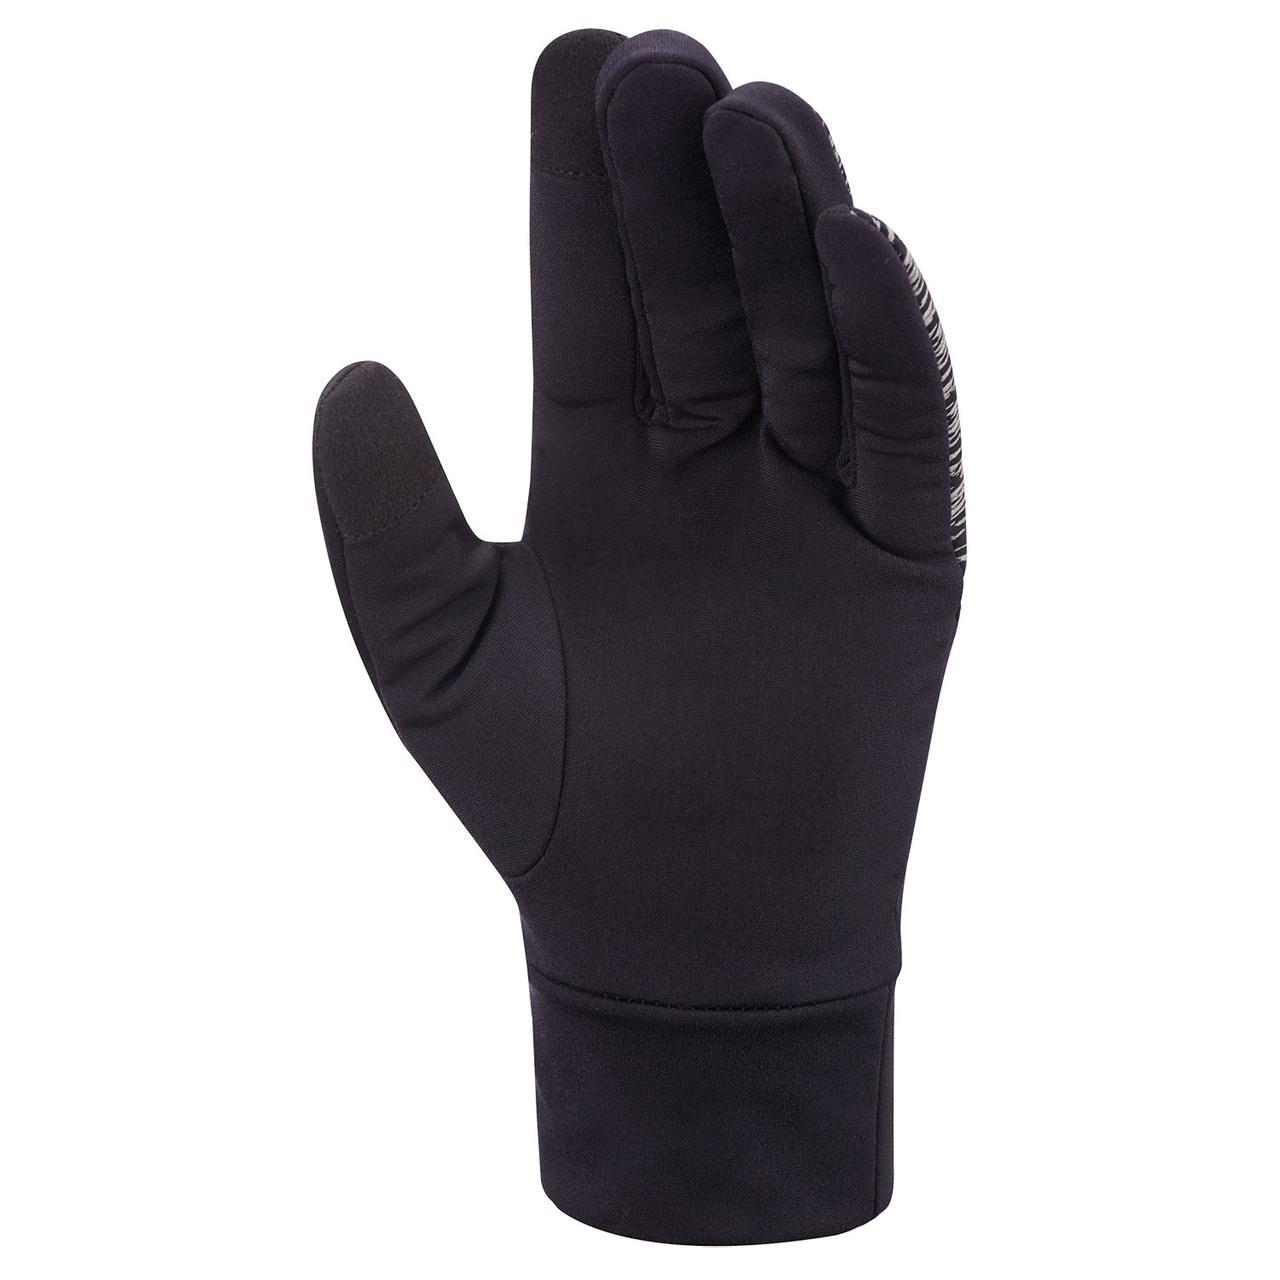 Перчатки Mizuno Windproof Glove J2GY85511-09